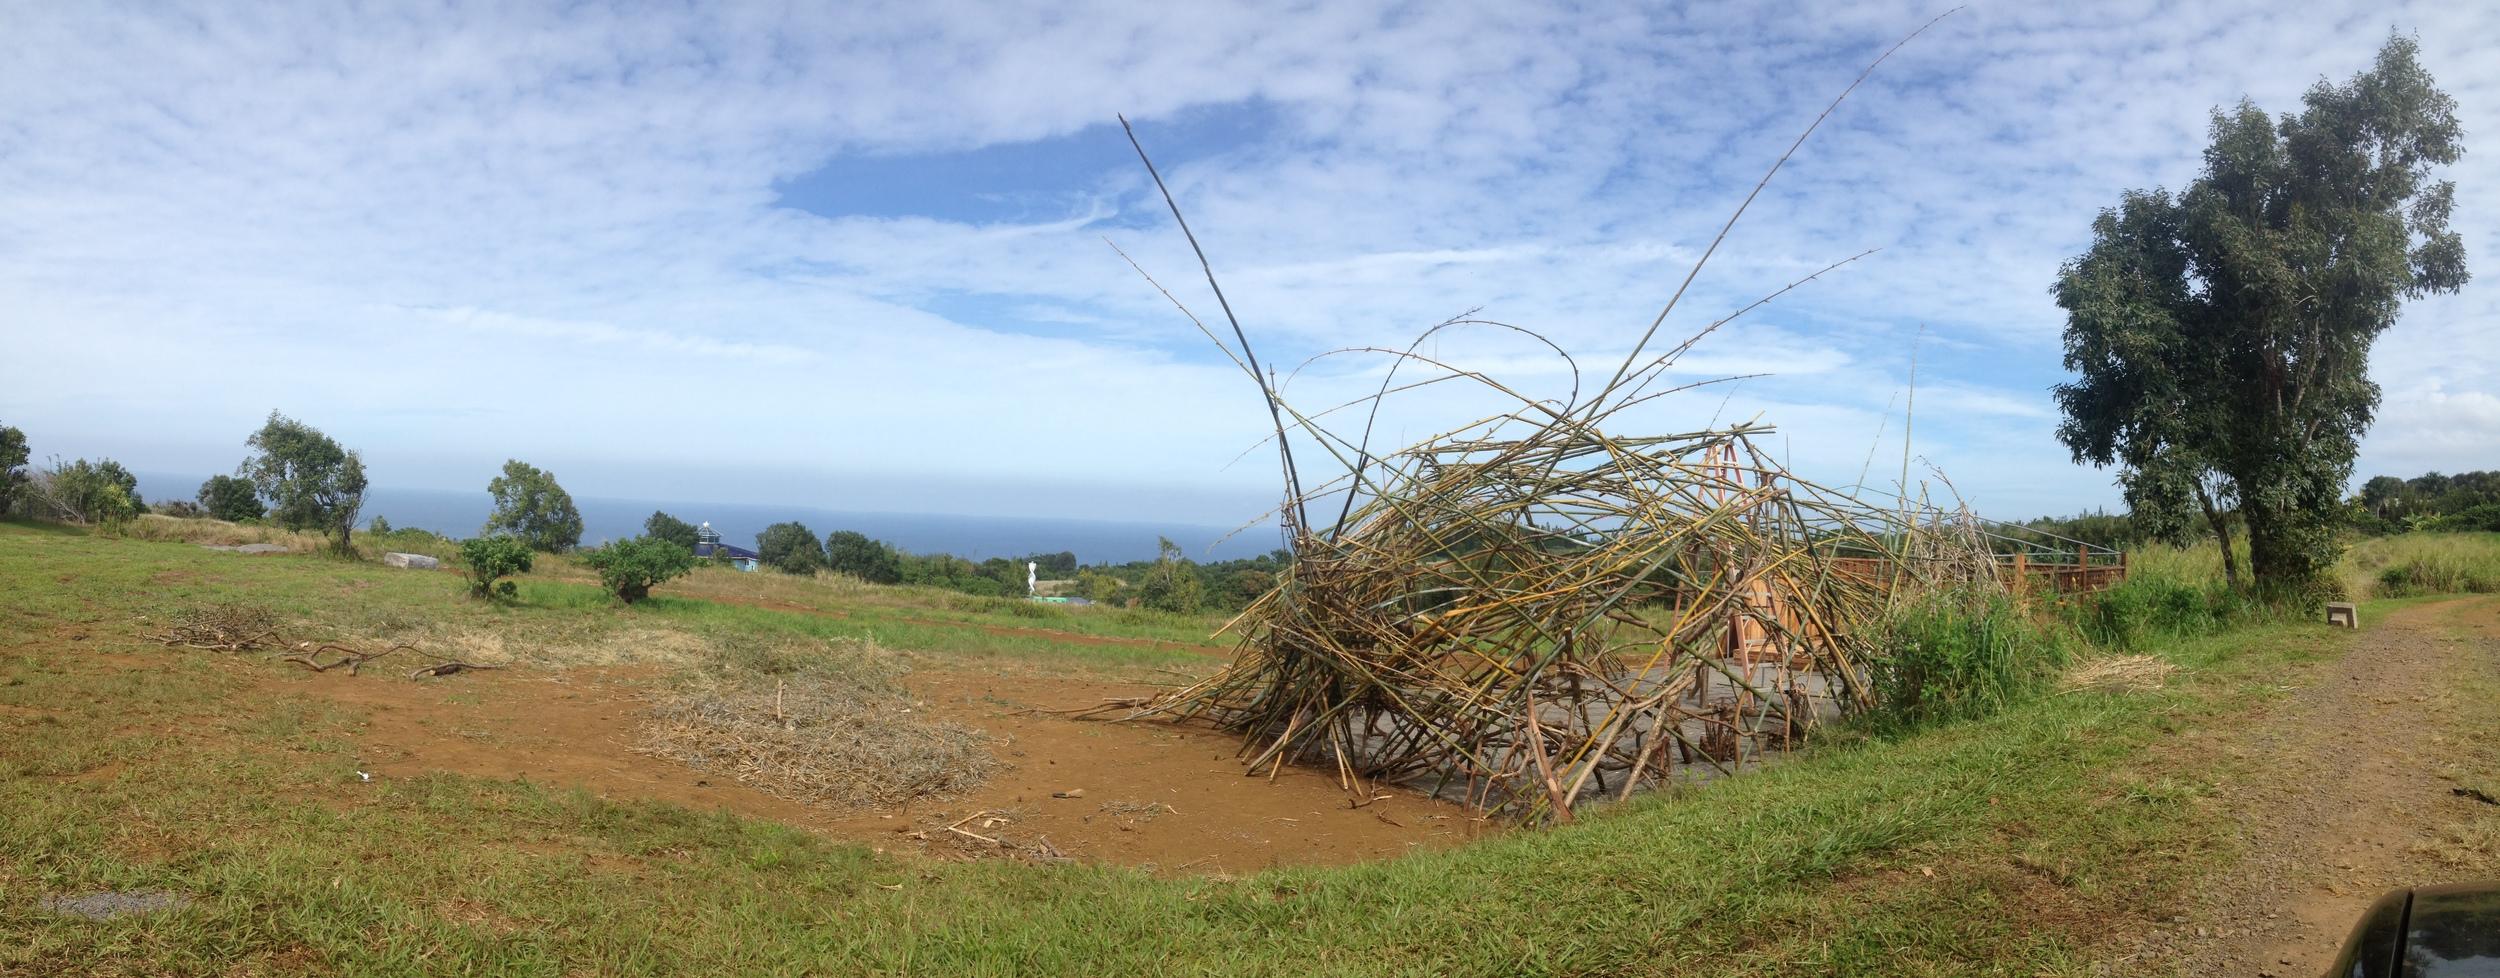 Maui Sacred Earth c.JPG